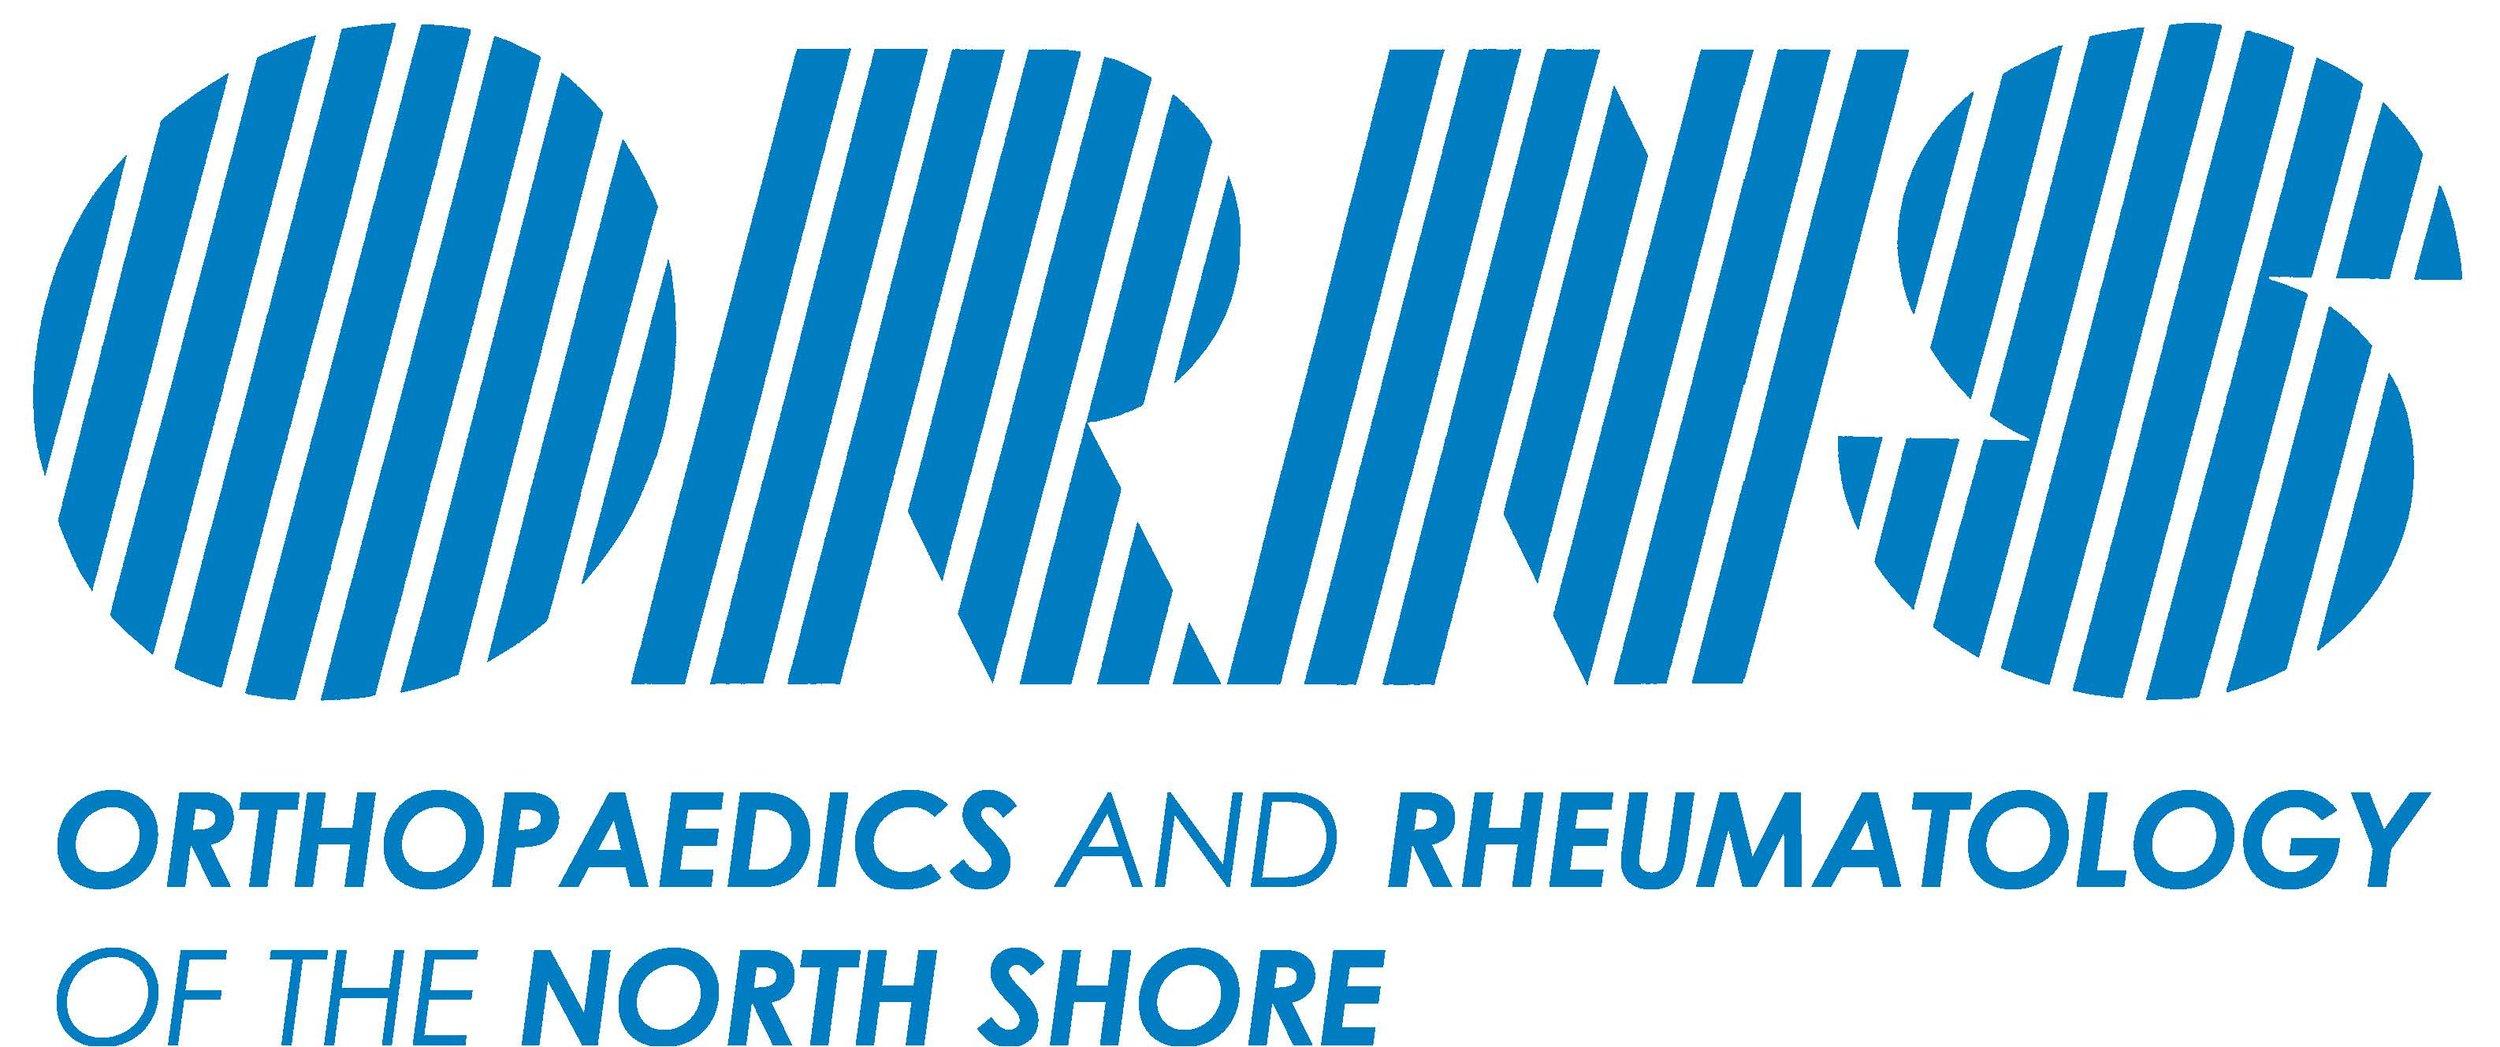 ORNS Logo.jpg